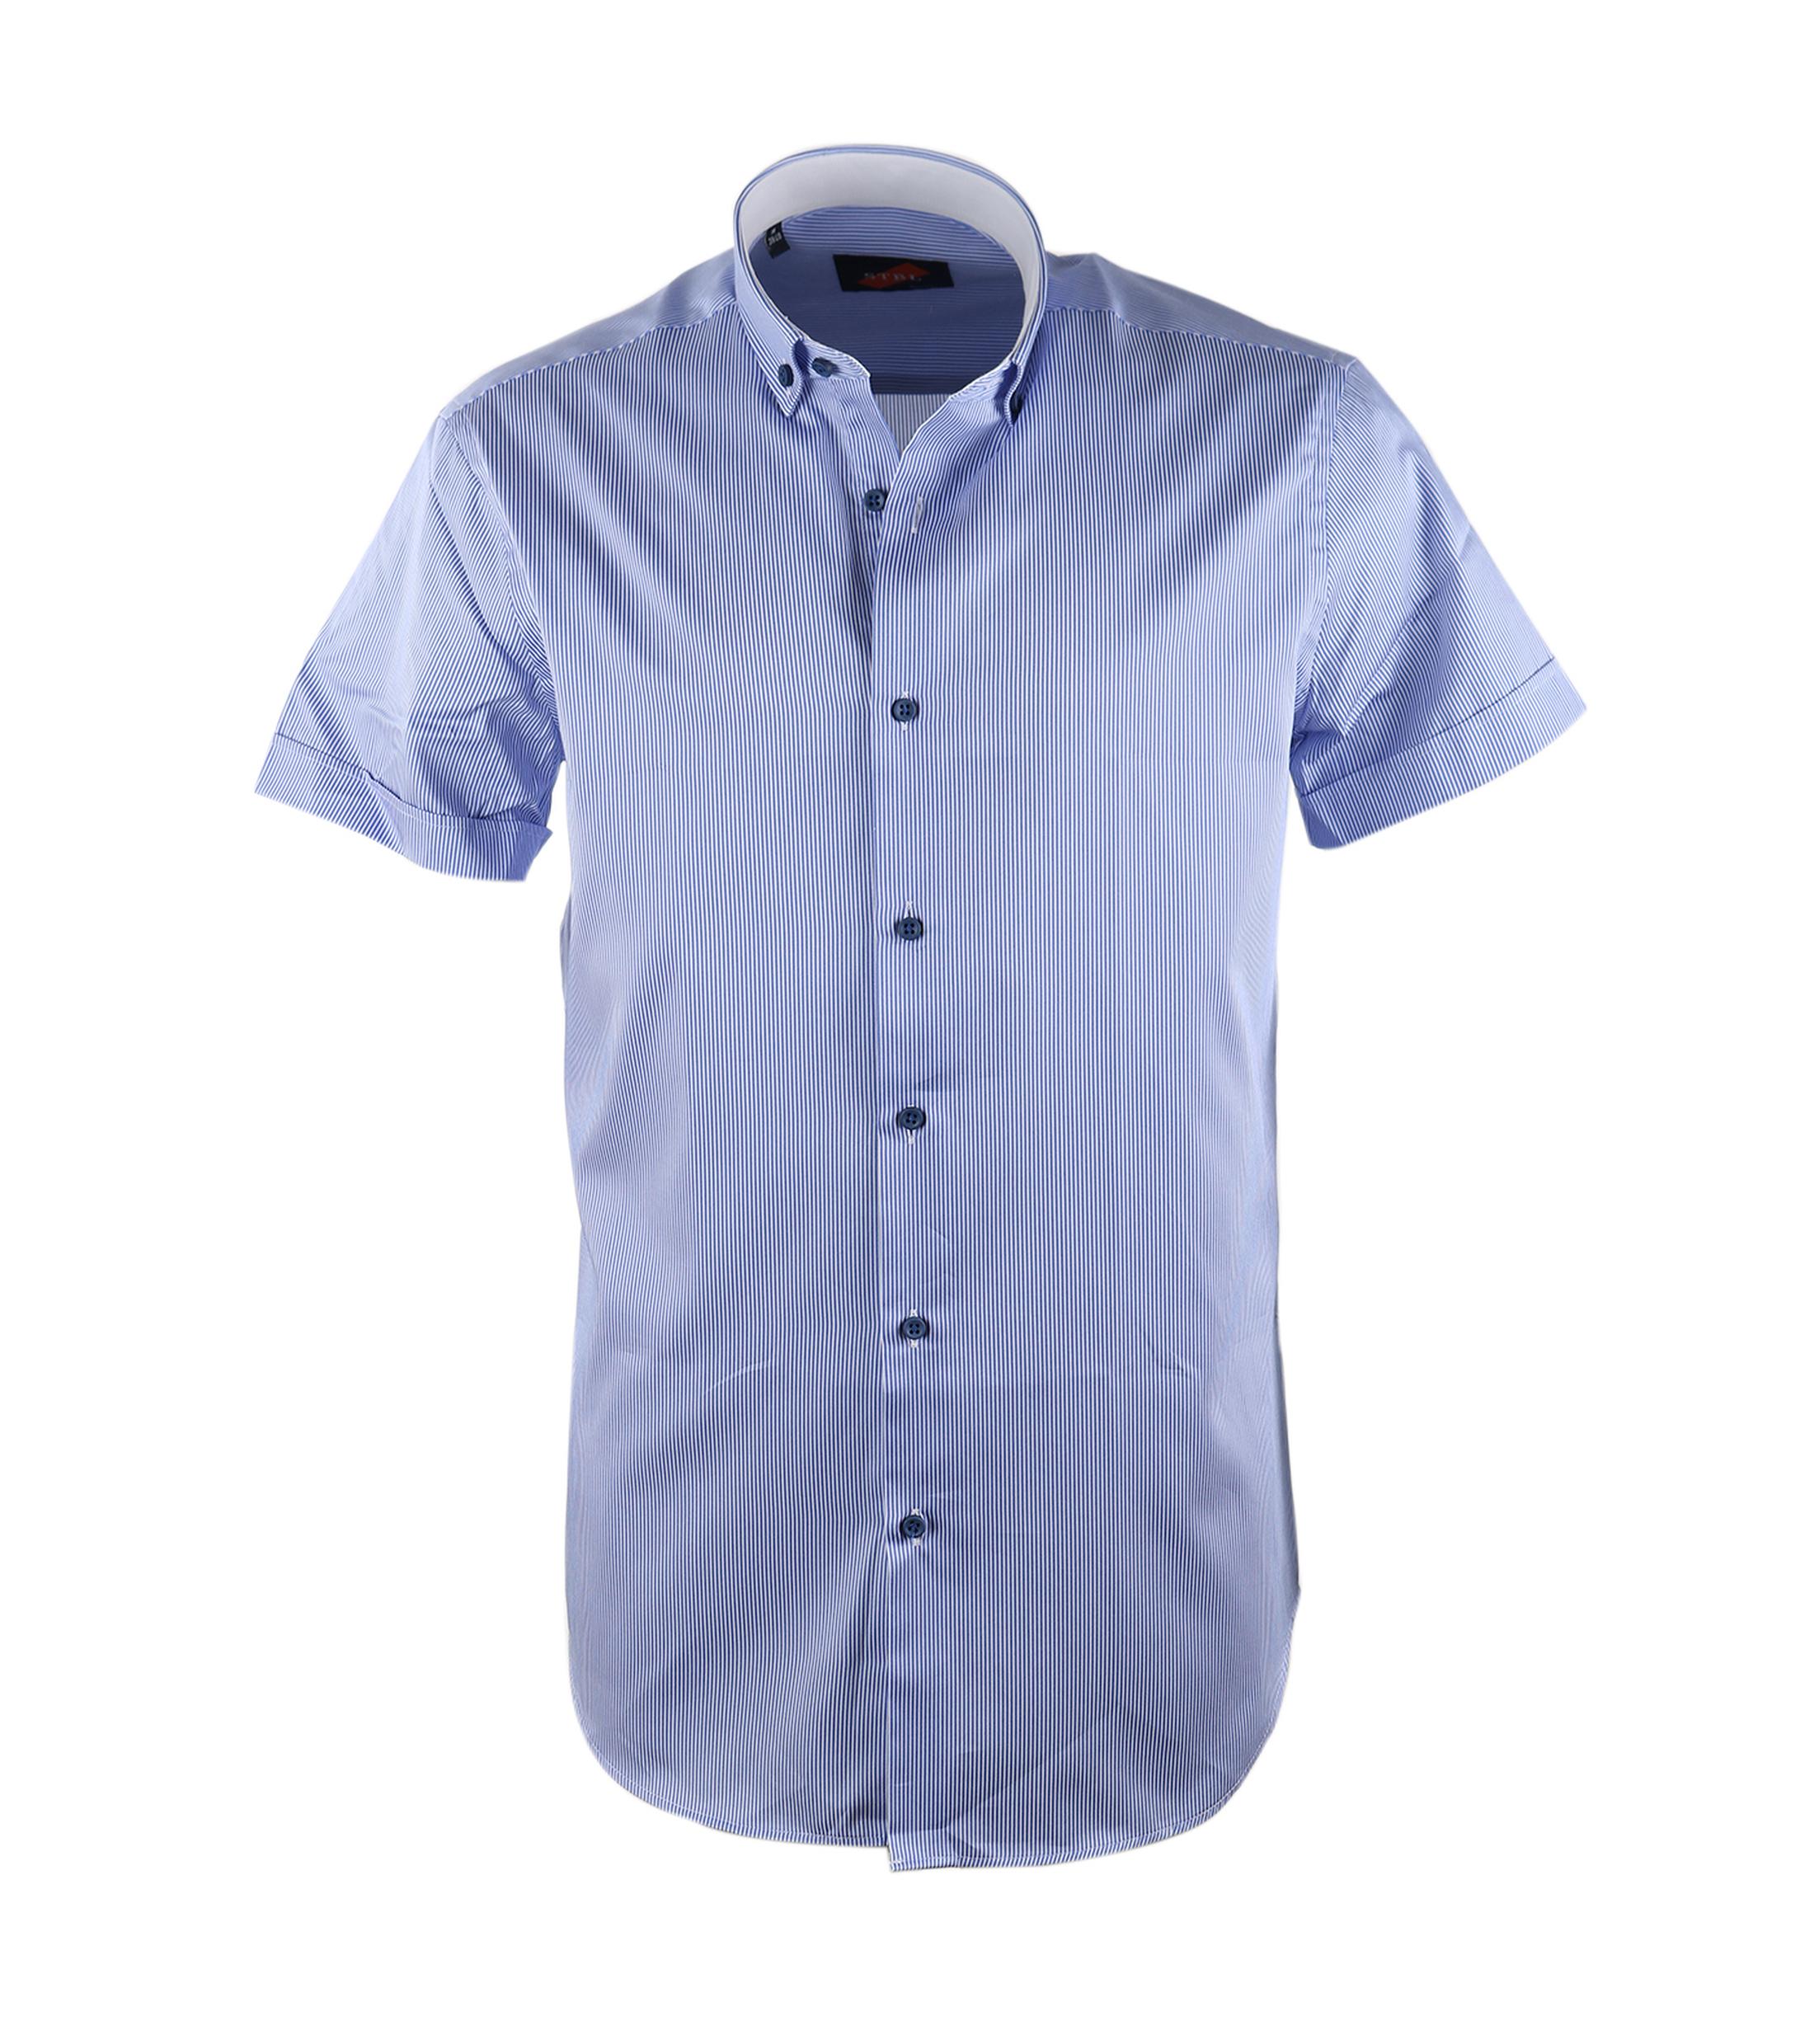 Casual Overhemd S3-6 Blauw Wit foto 0